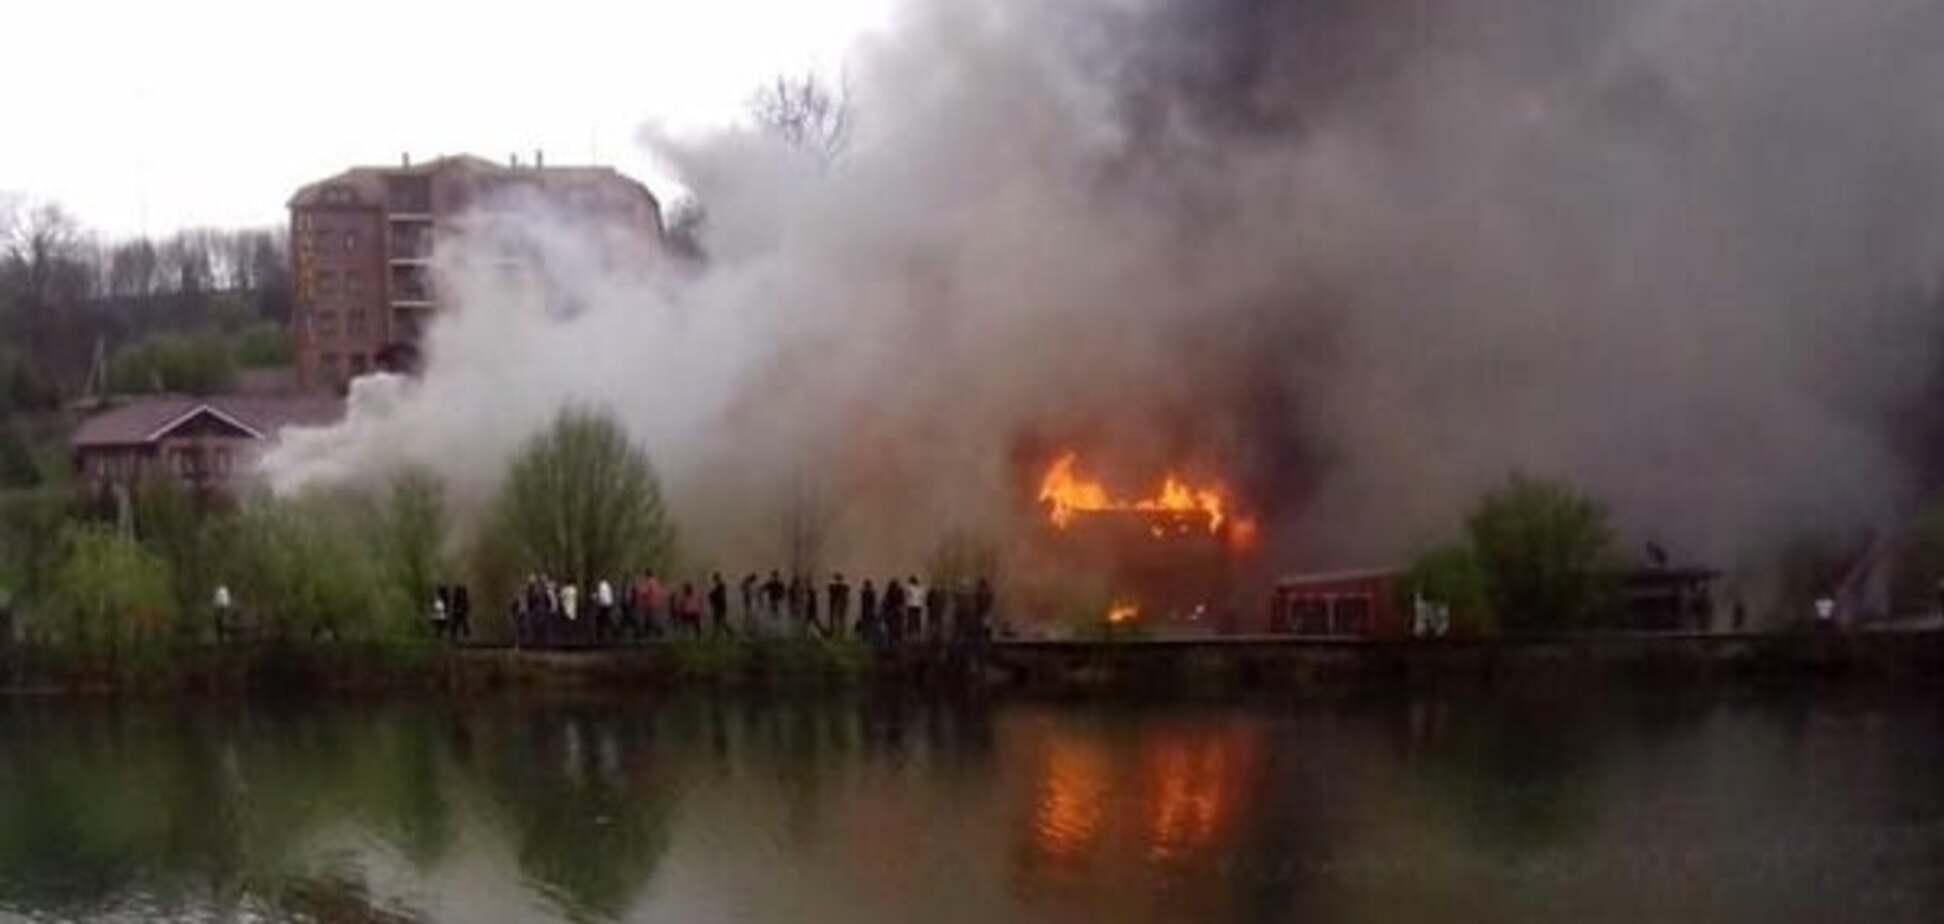 На Закарпатті спалахнув комплекс 'Здравниця Карпат'. Фотофакт